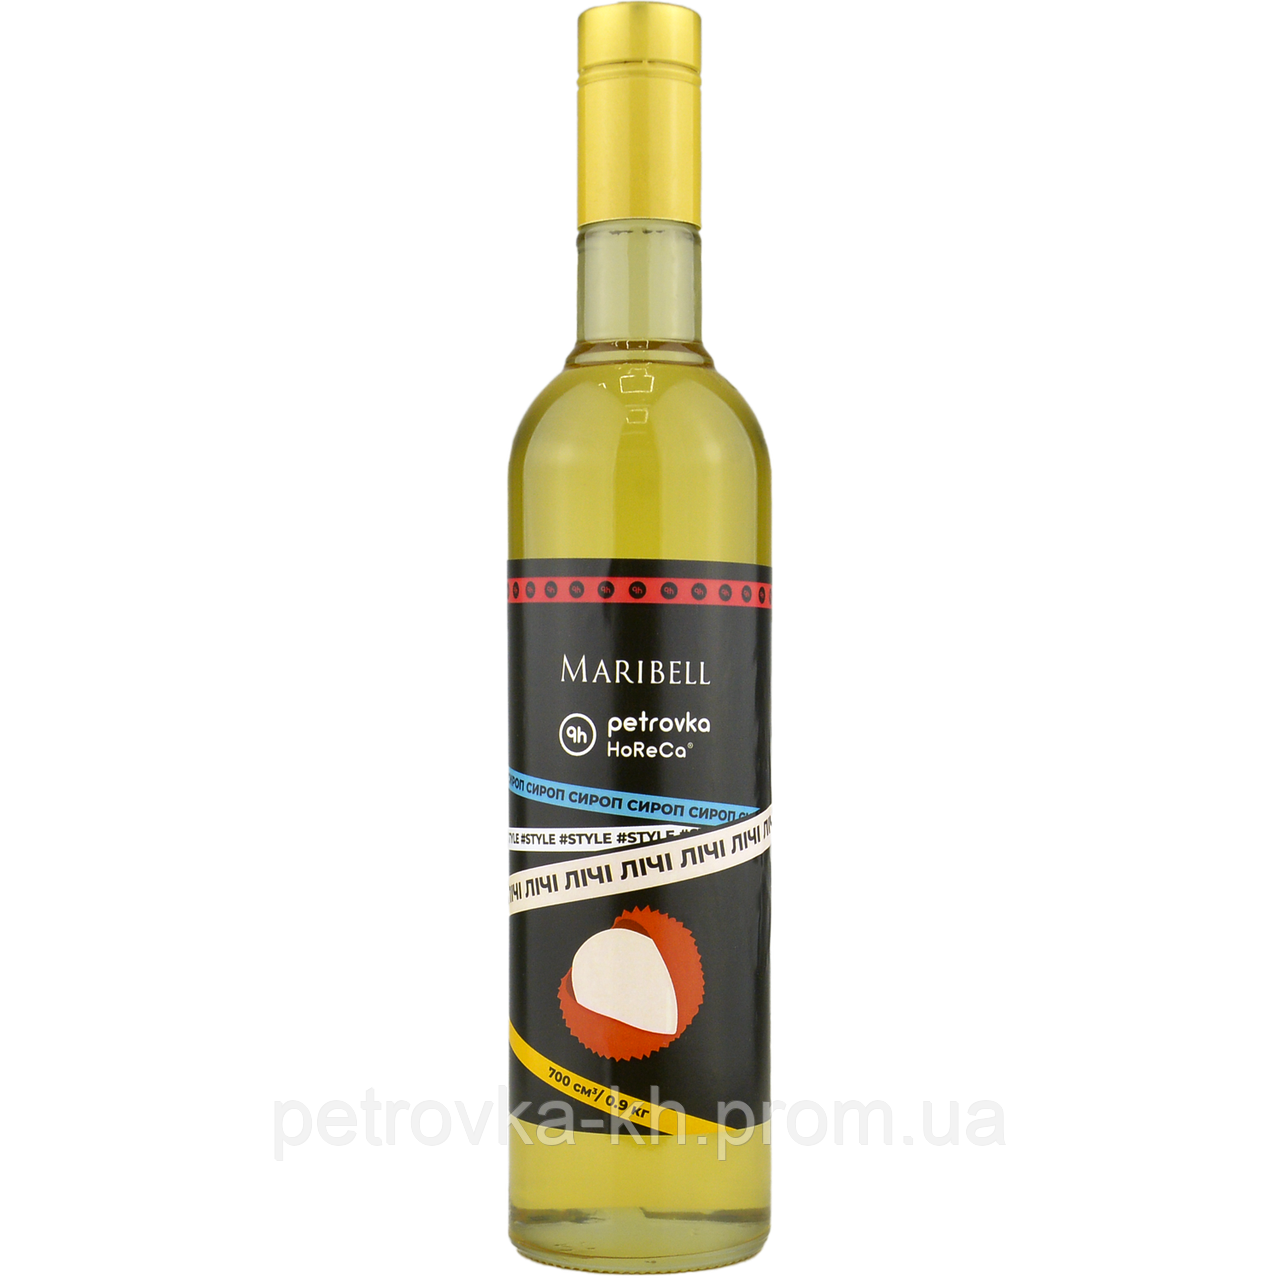 Сироп 'Личи' для коктейлей Maribell-Petrovka Horeca 700мл